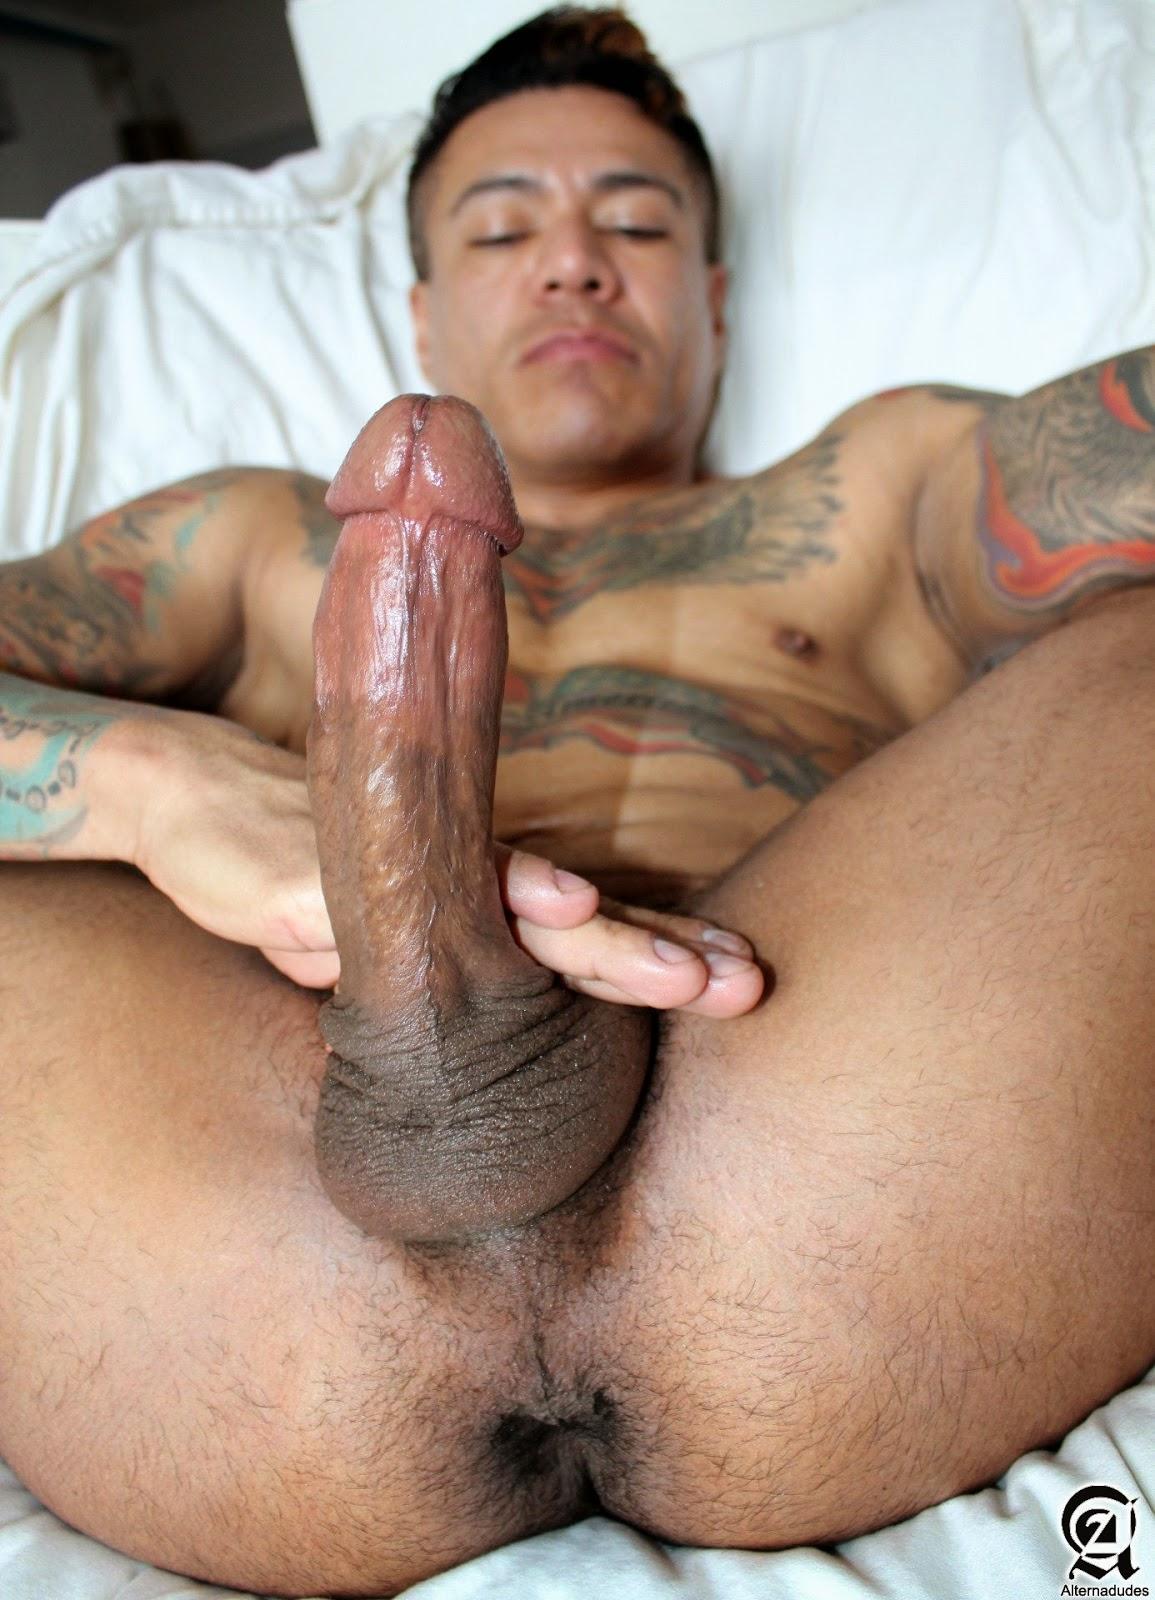 Gay swamp moster porn pic erotic download